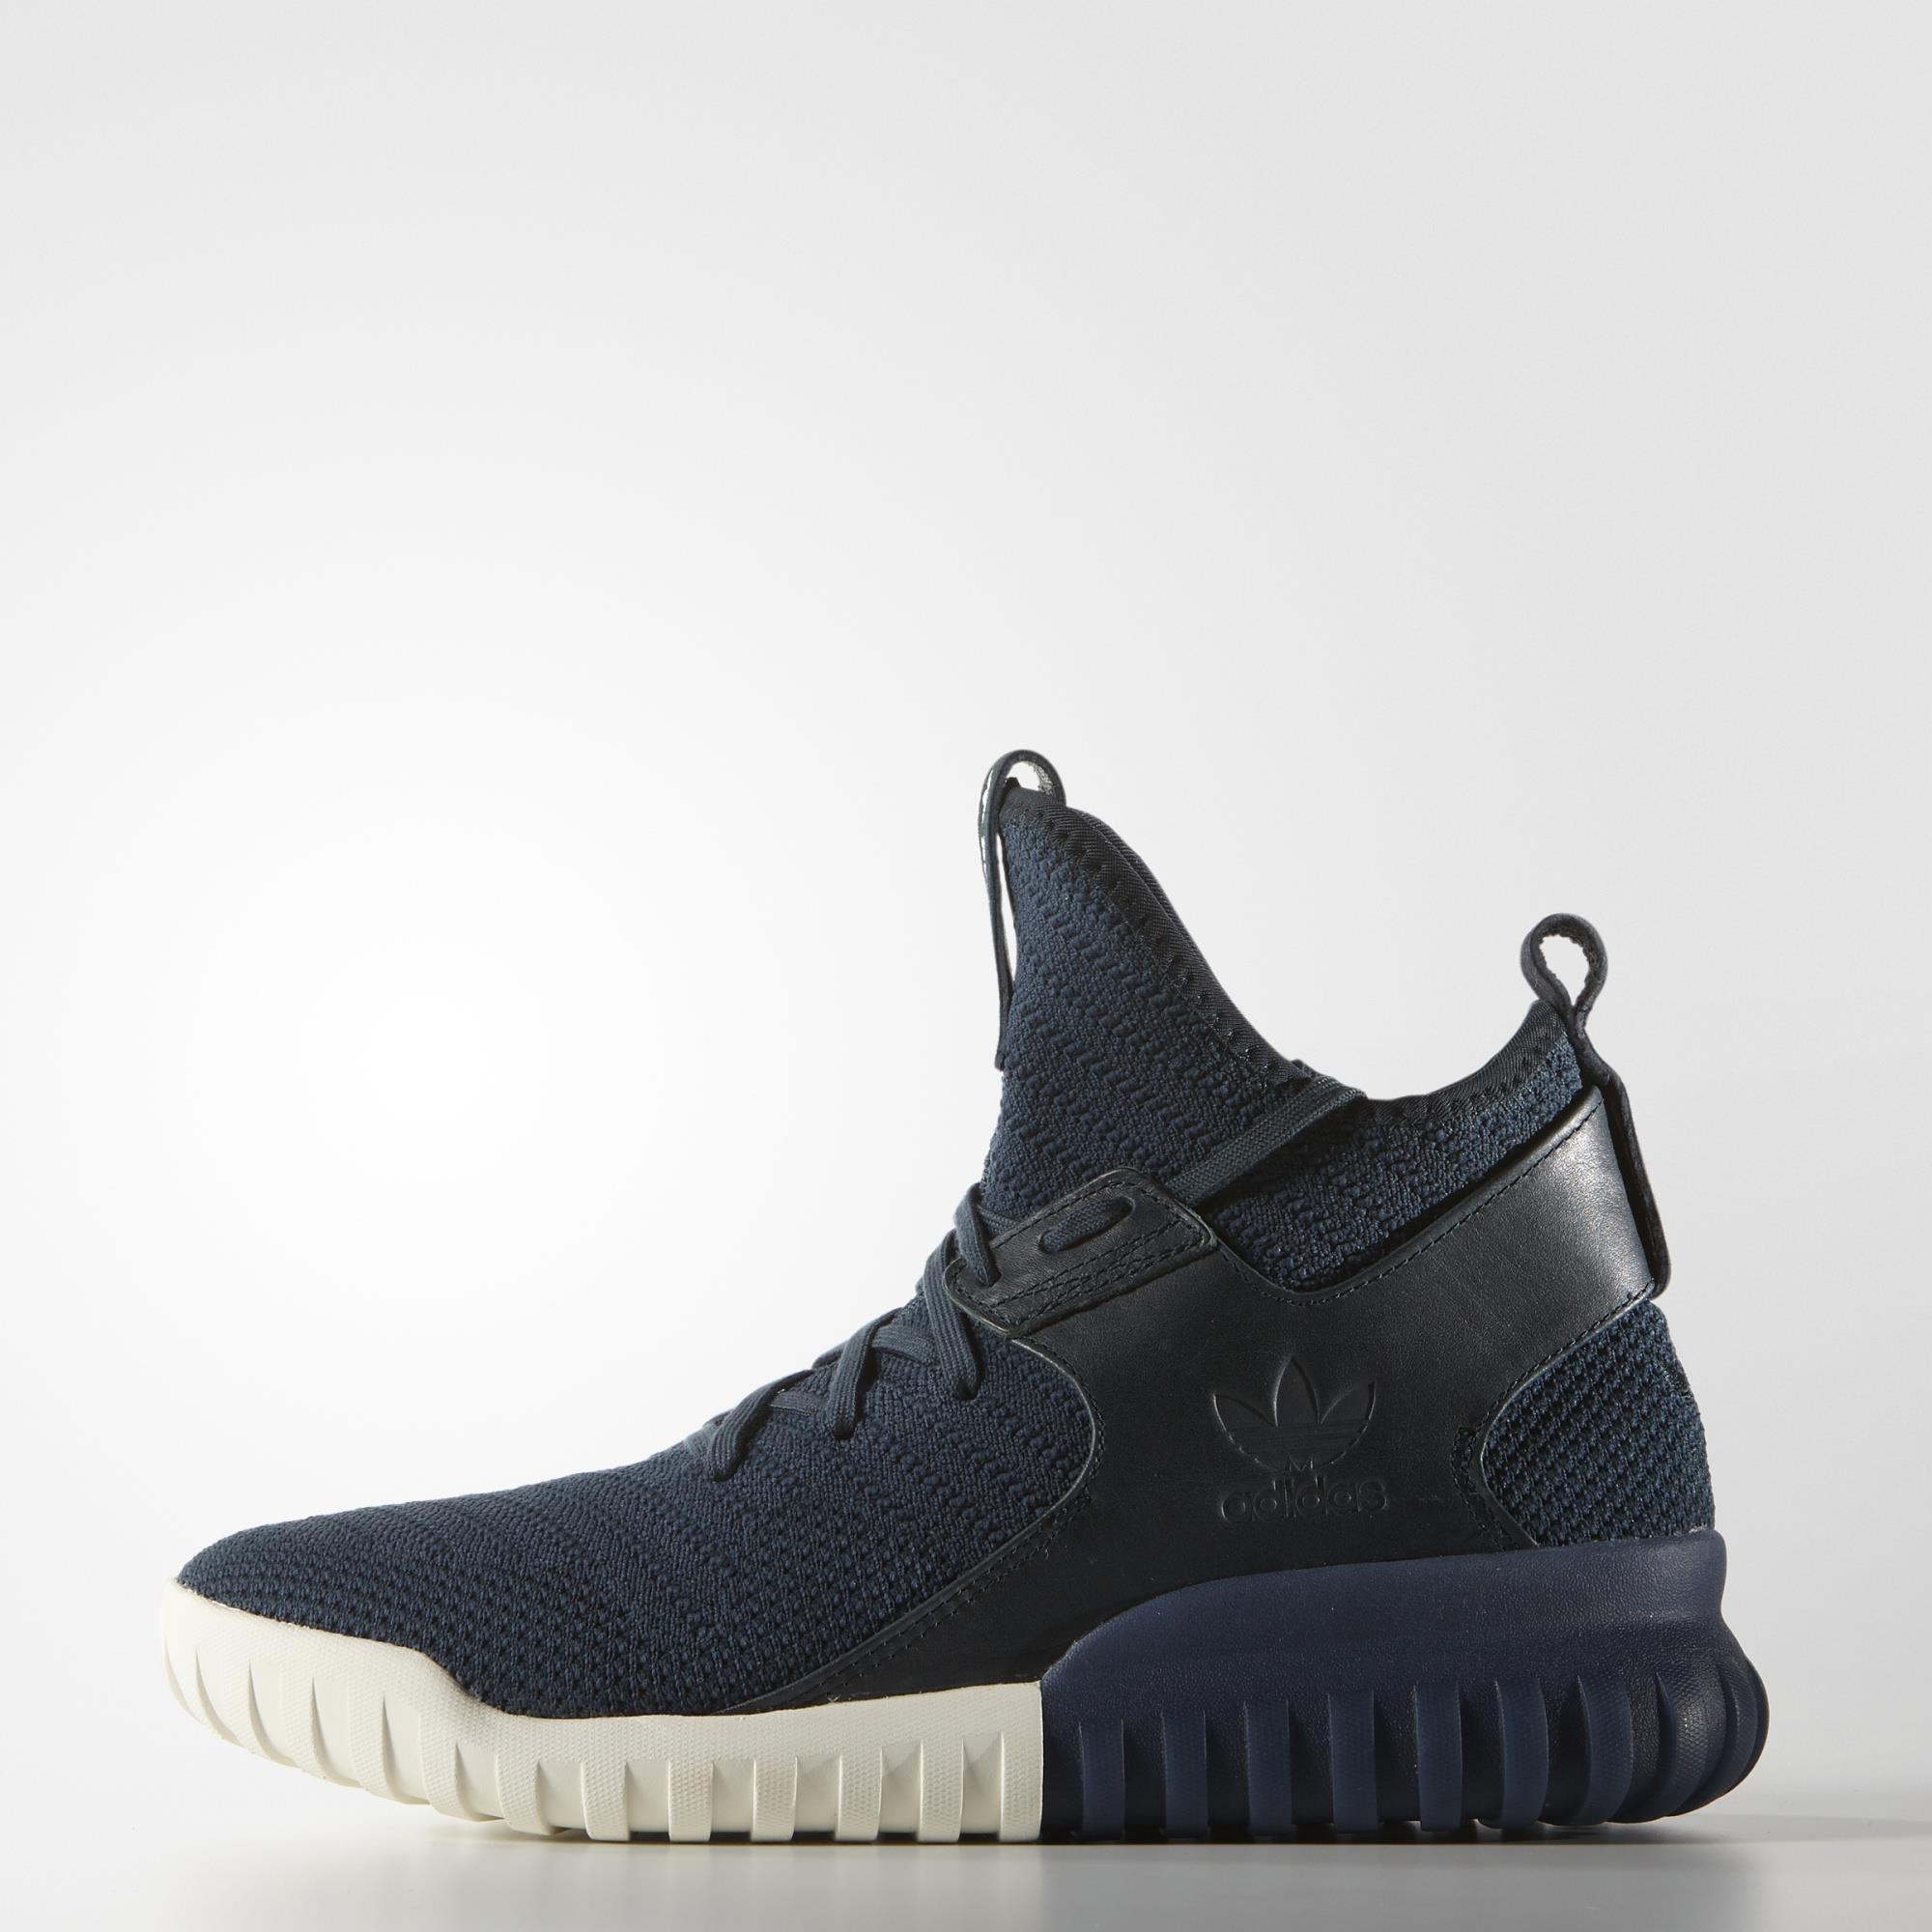 adidas schuh tubular x knit core black